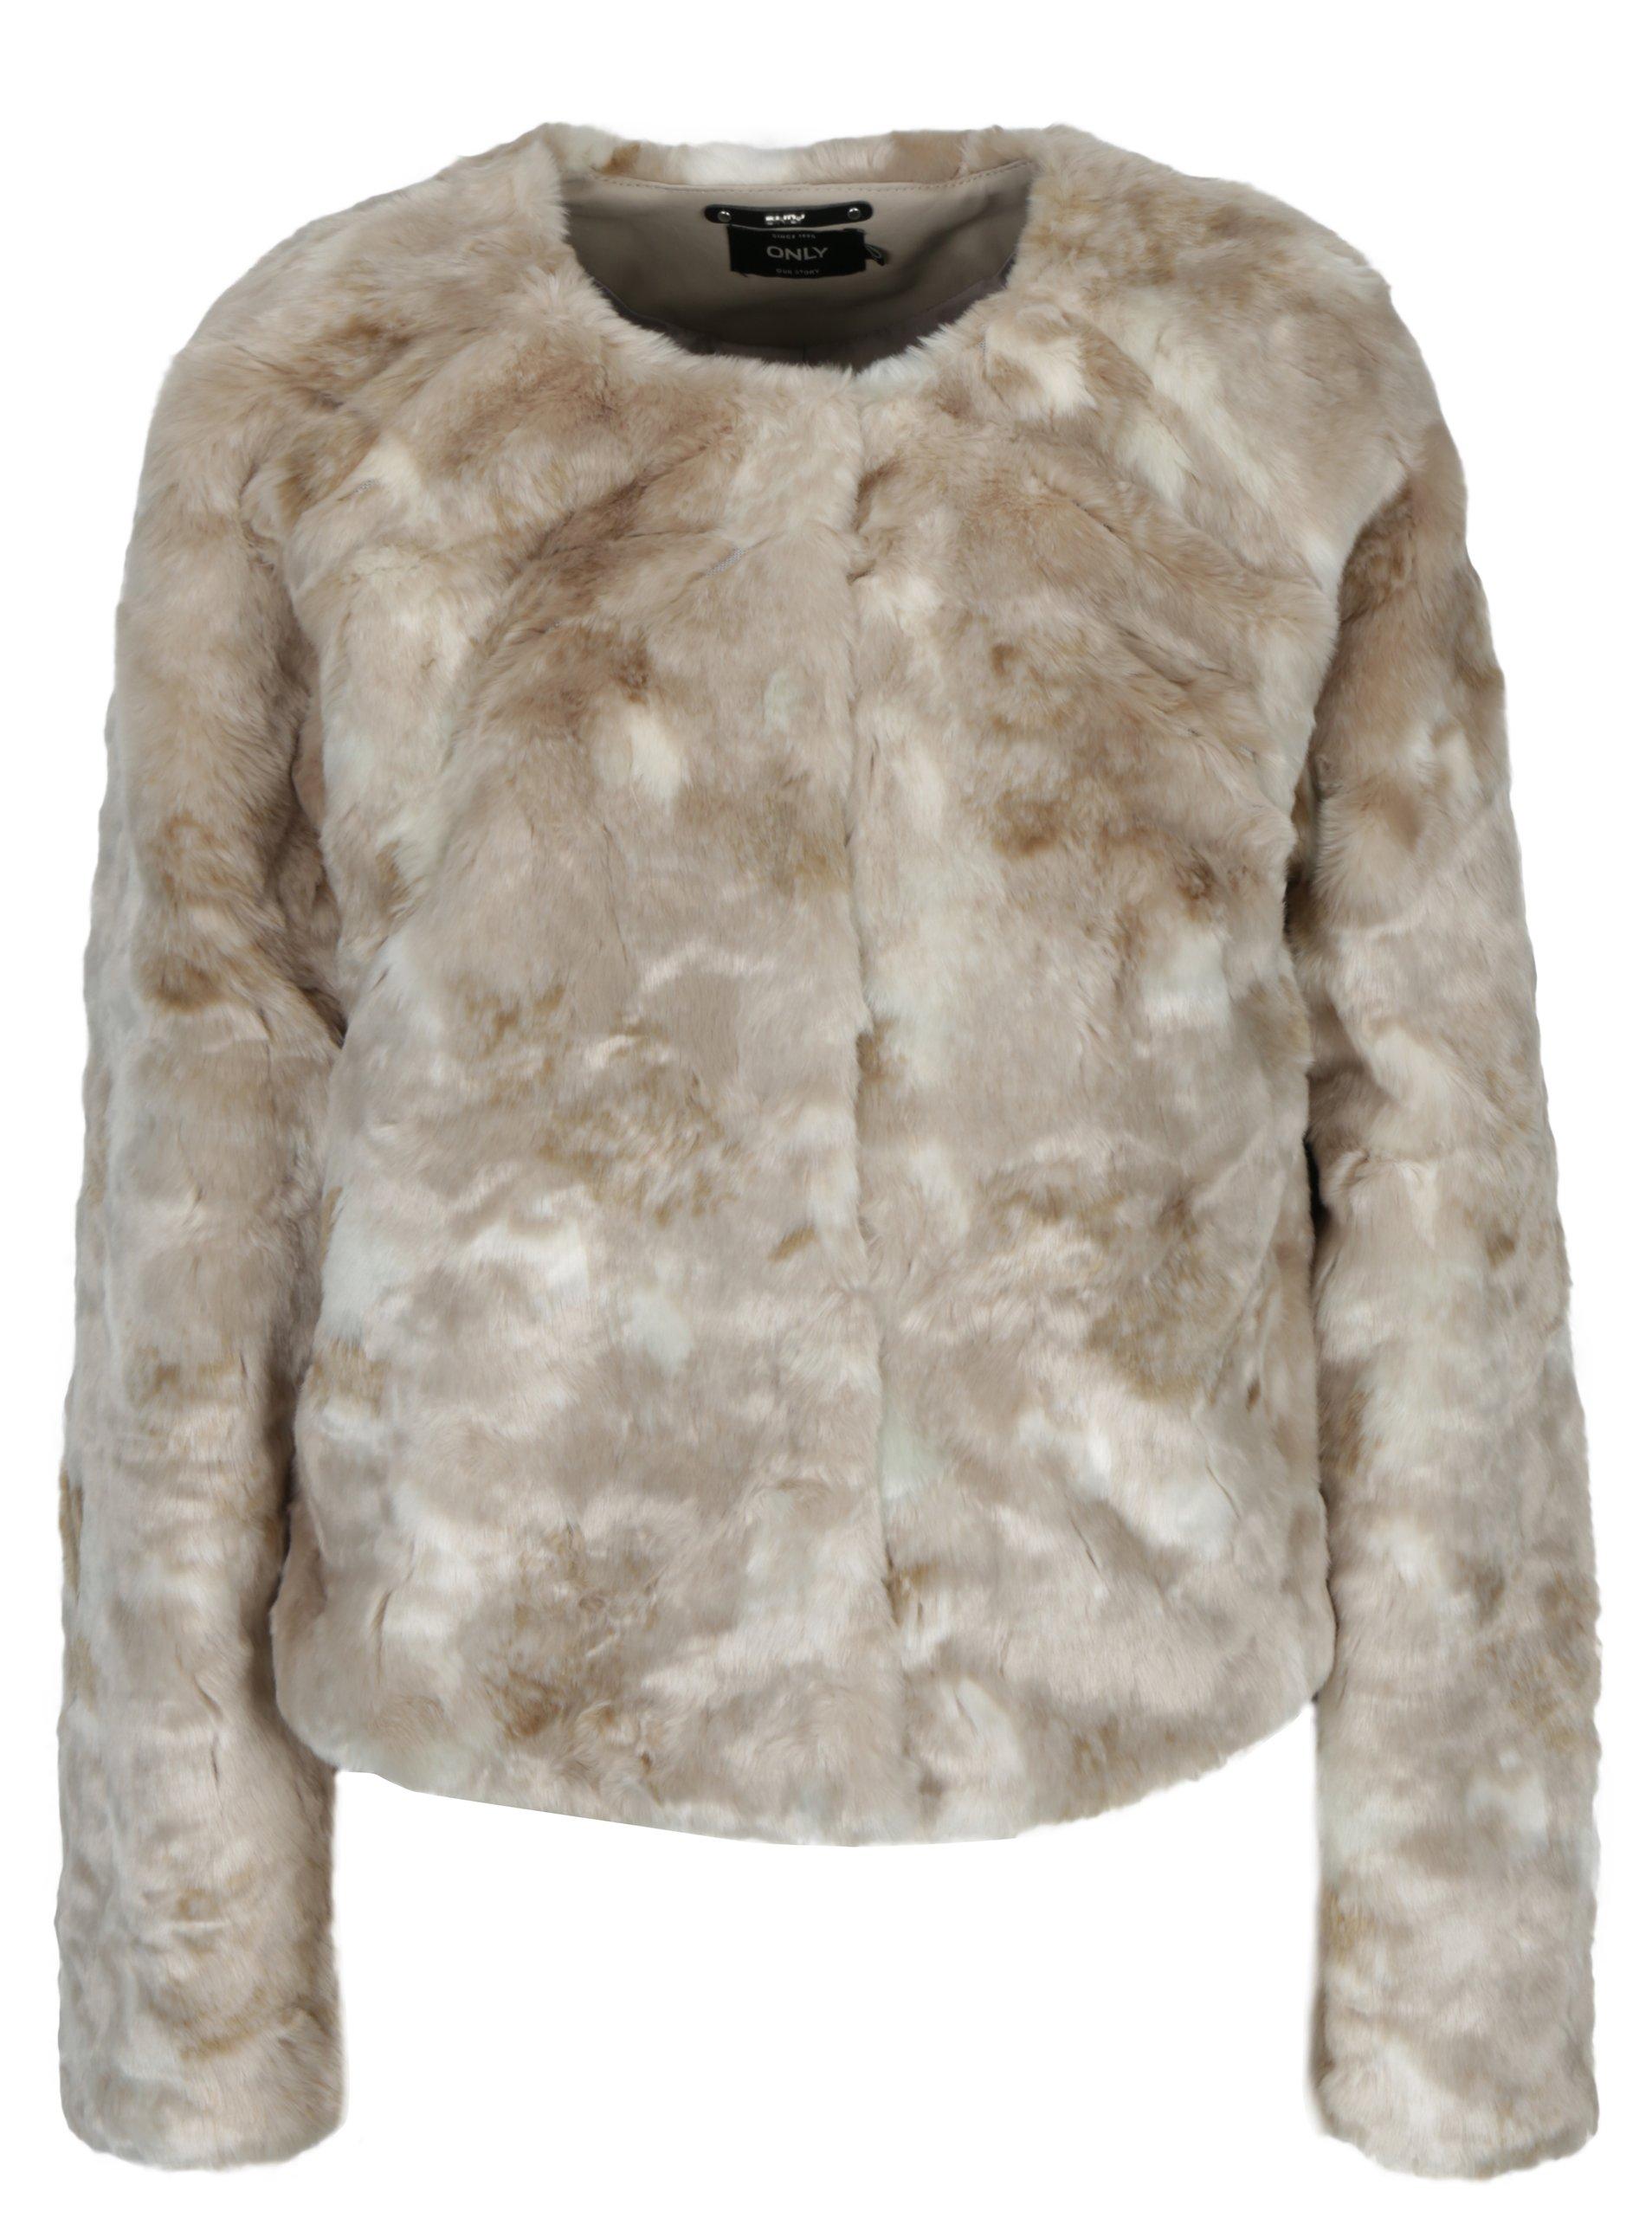 Béžový krátký kabát z umělé kožešiny ONLY Winnie